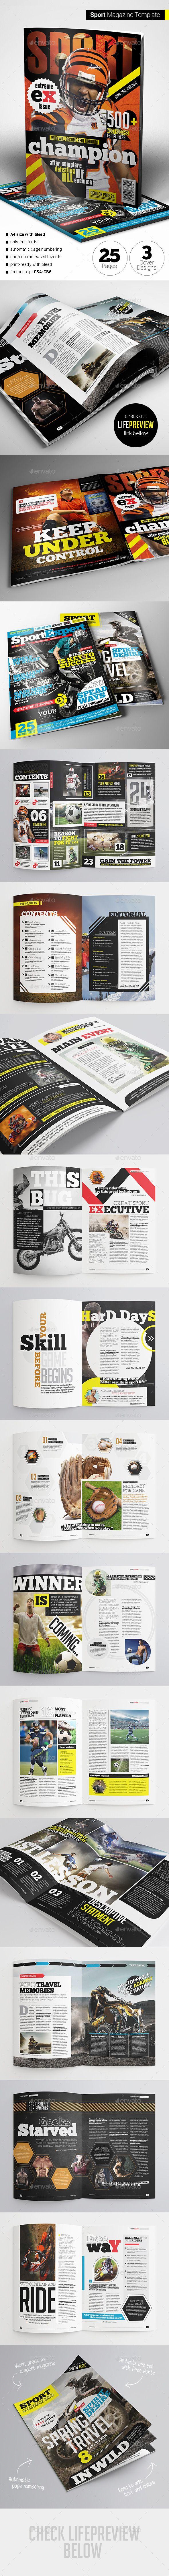 Sport Magazine | Sports magazine, Indesign magazine templates and ...